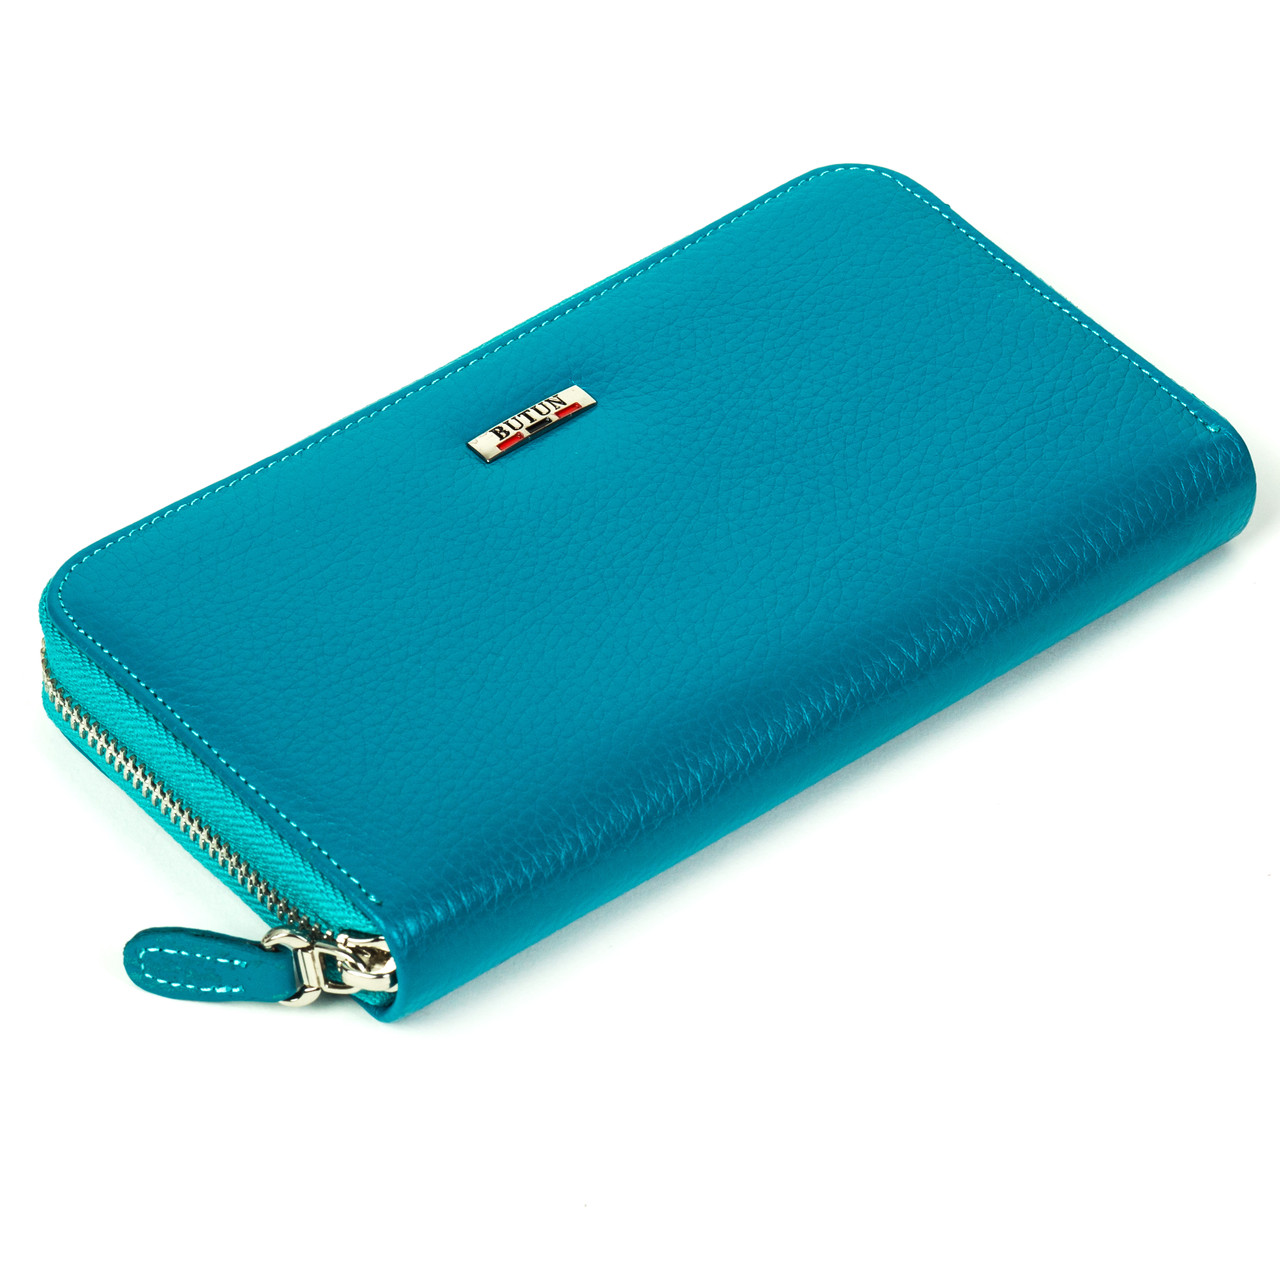 Женский кошелек Butun 639-004-050 кожаный бирюзовый